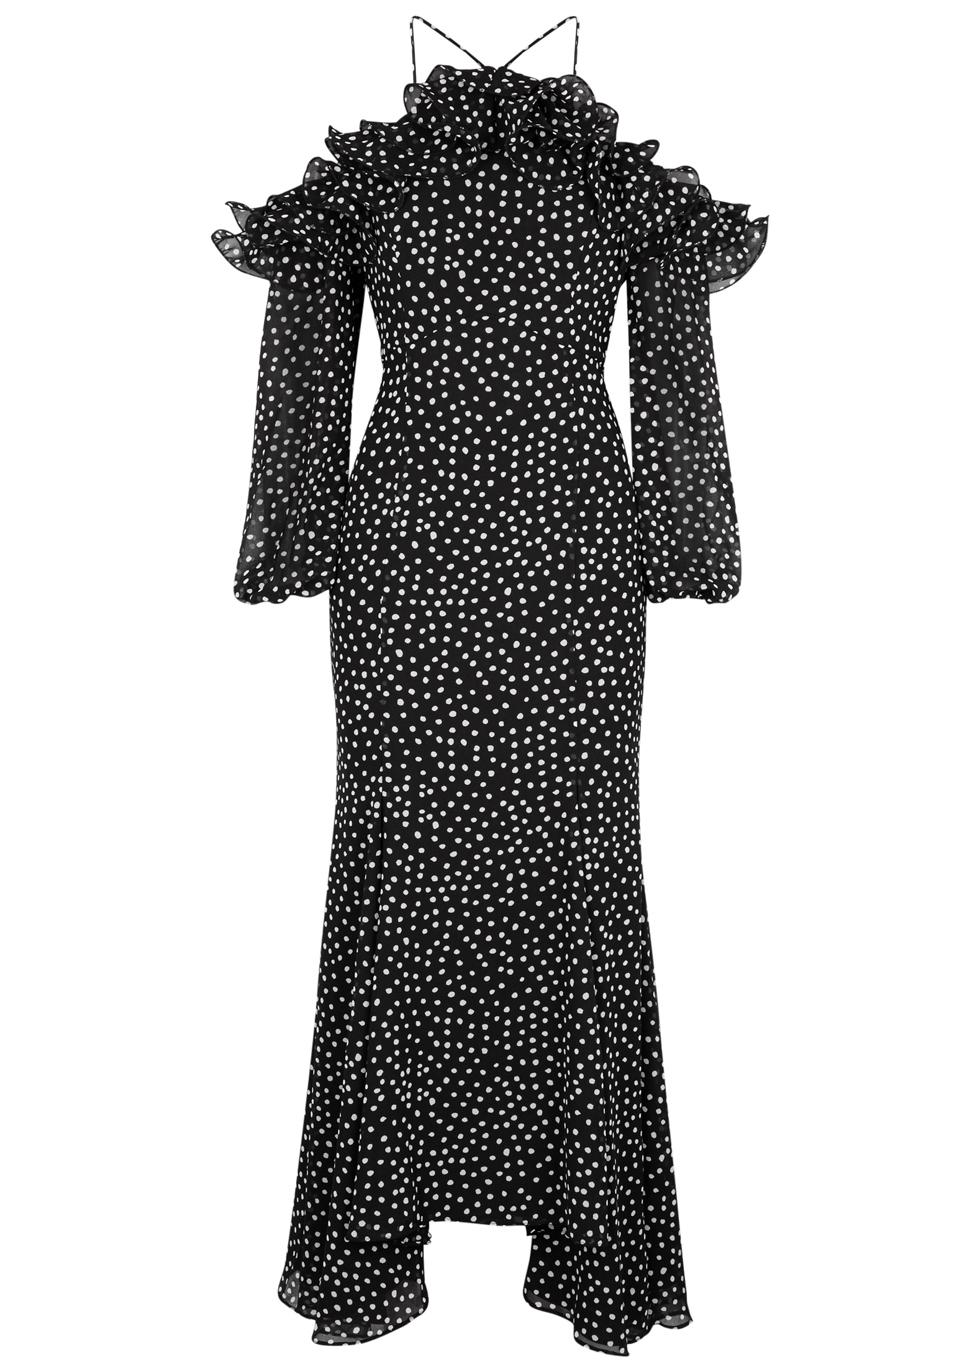 MOONSHINE RUFFLE-TRIMMED GEORGETTE DRESS